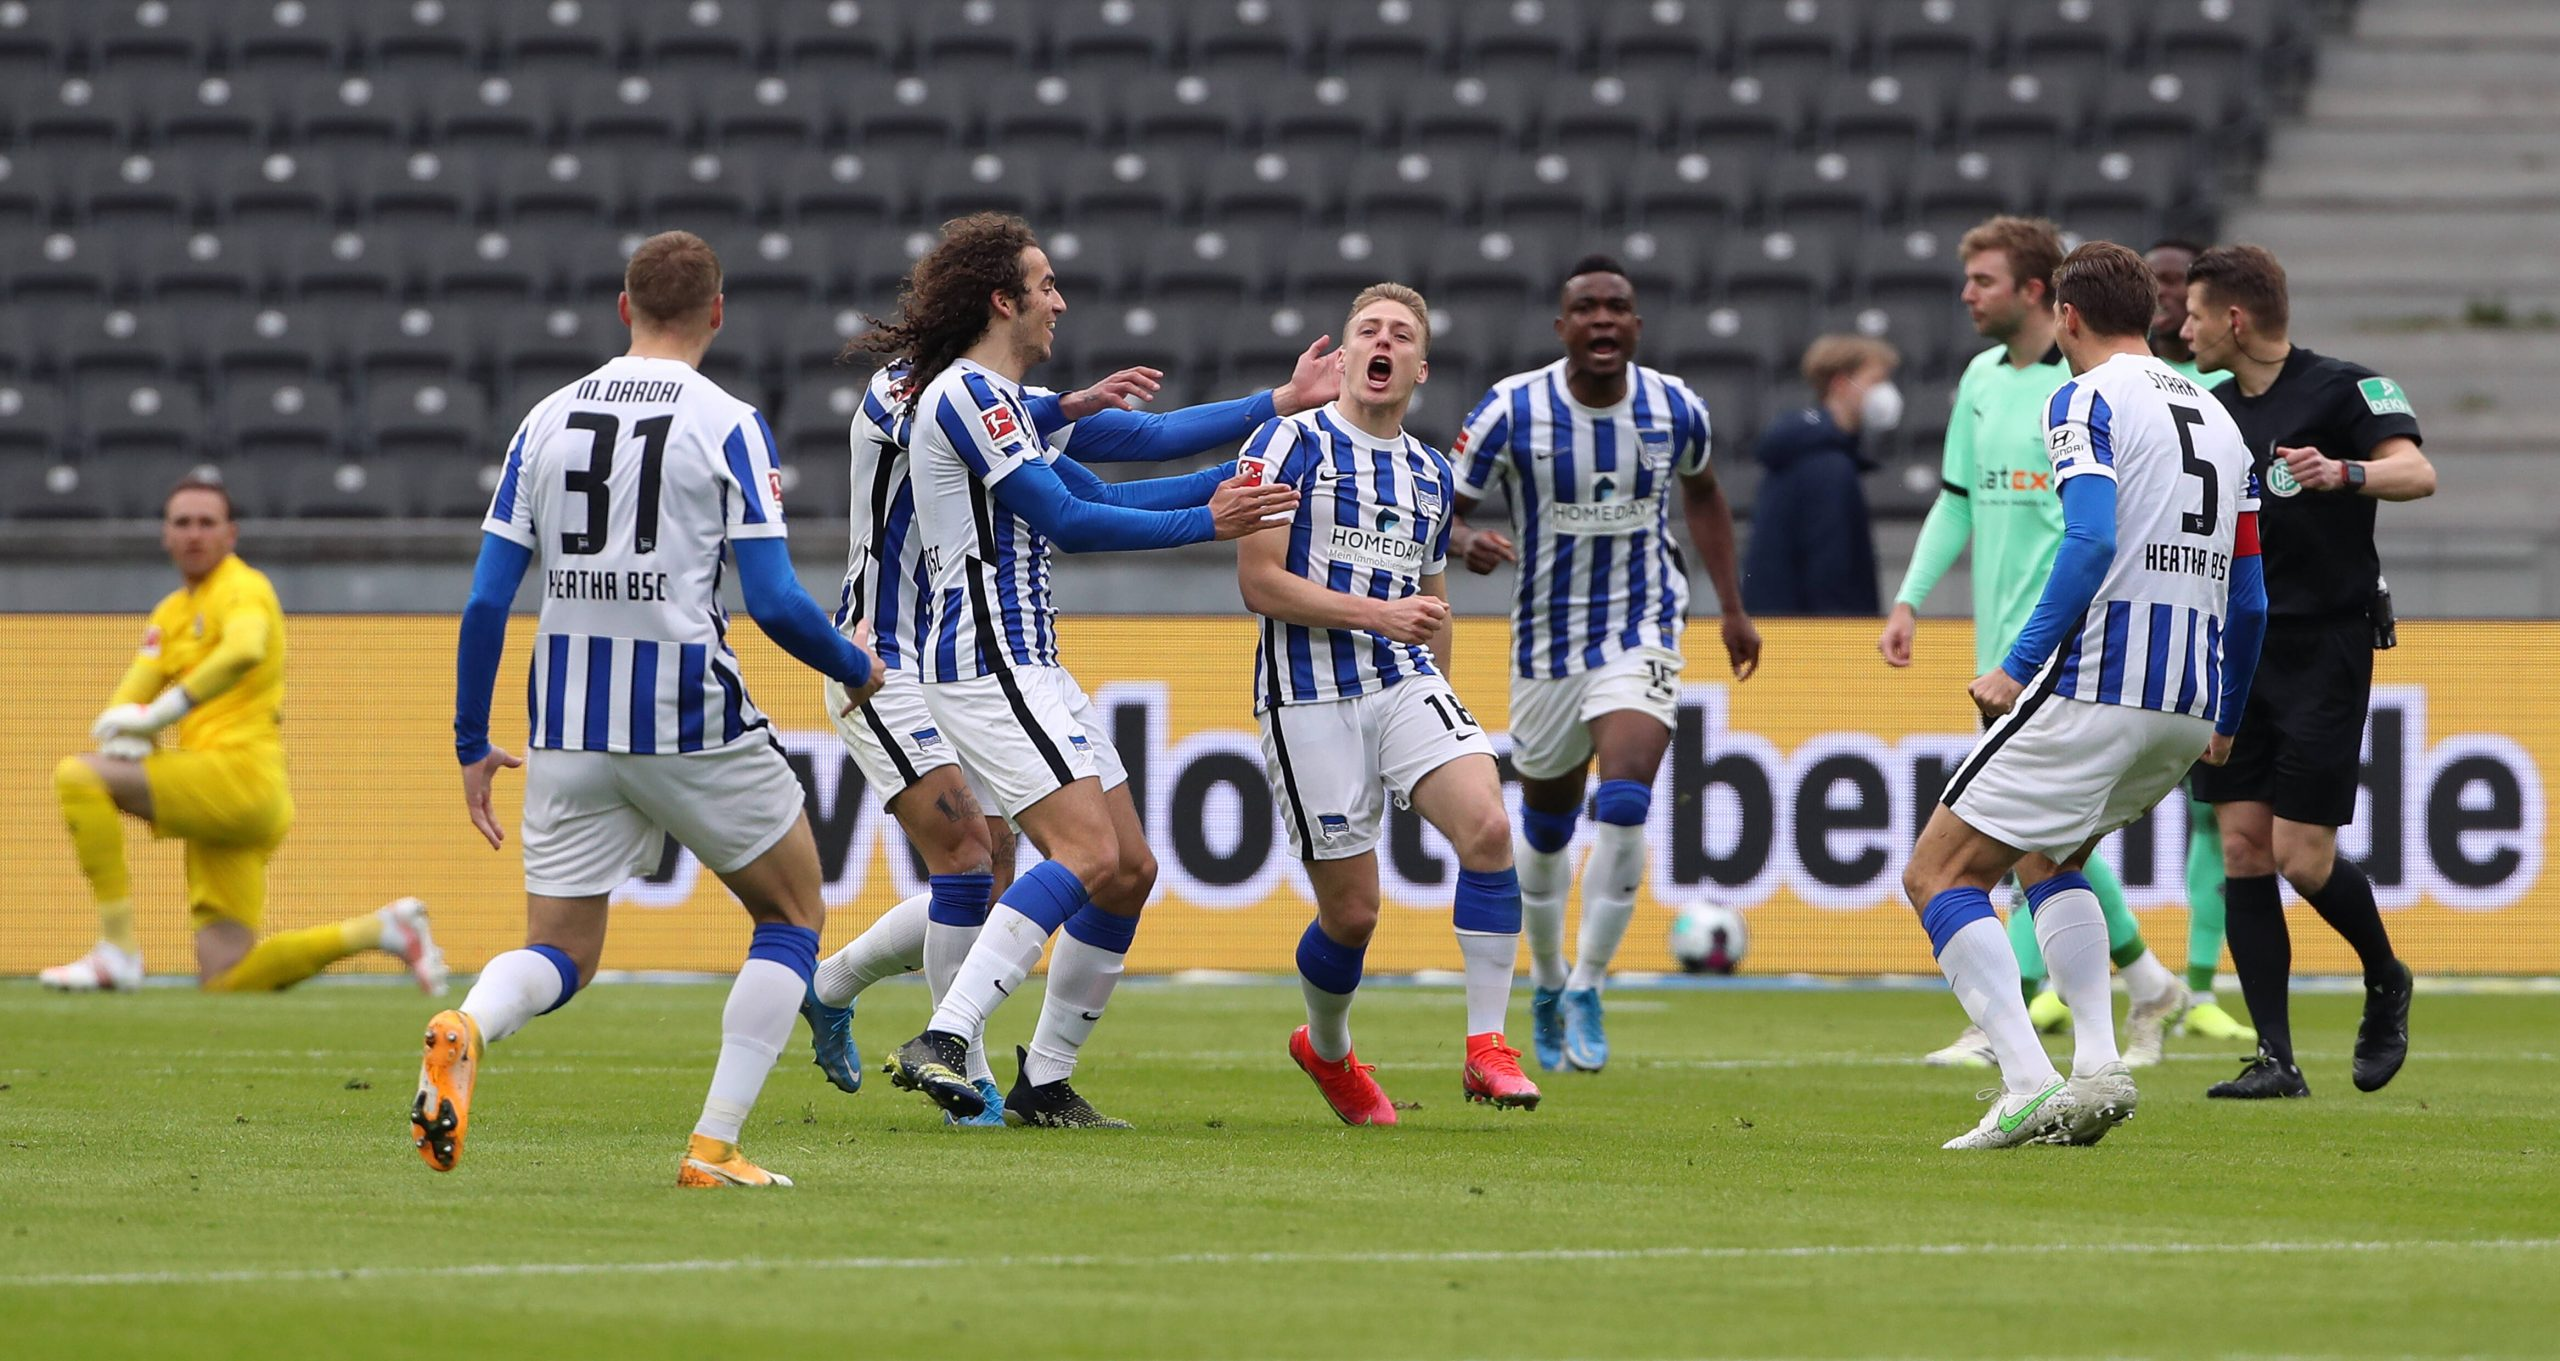 Hertha Mönchengladbach